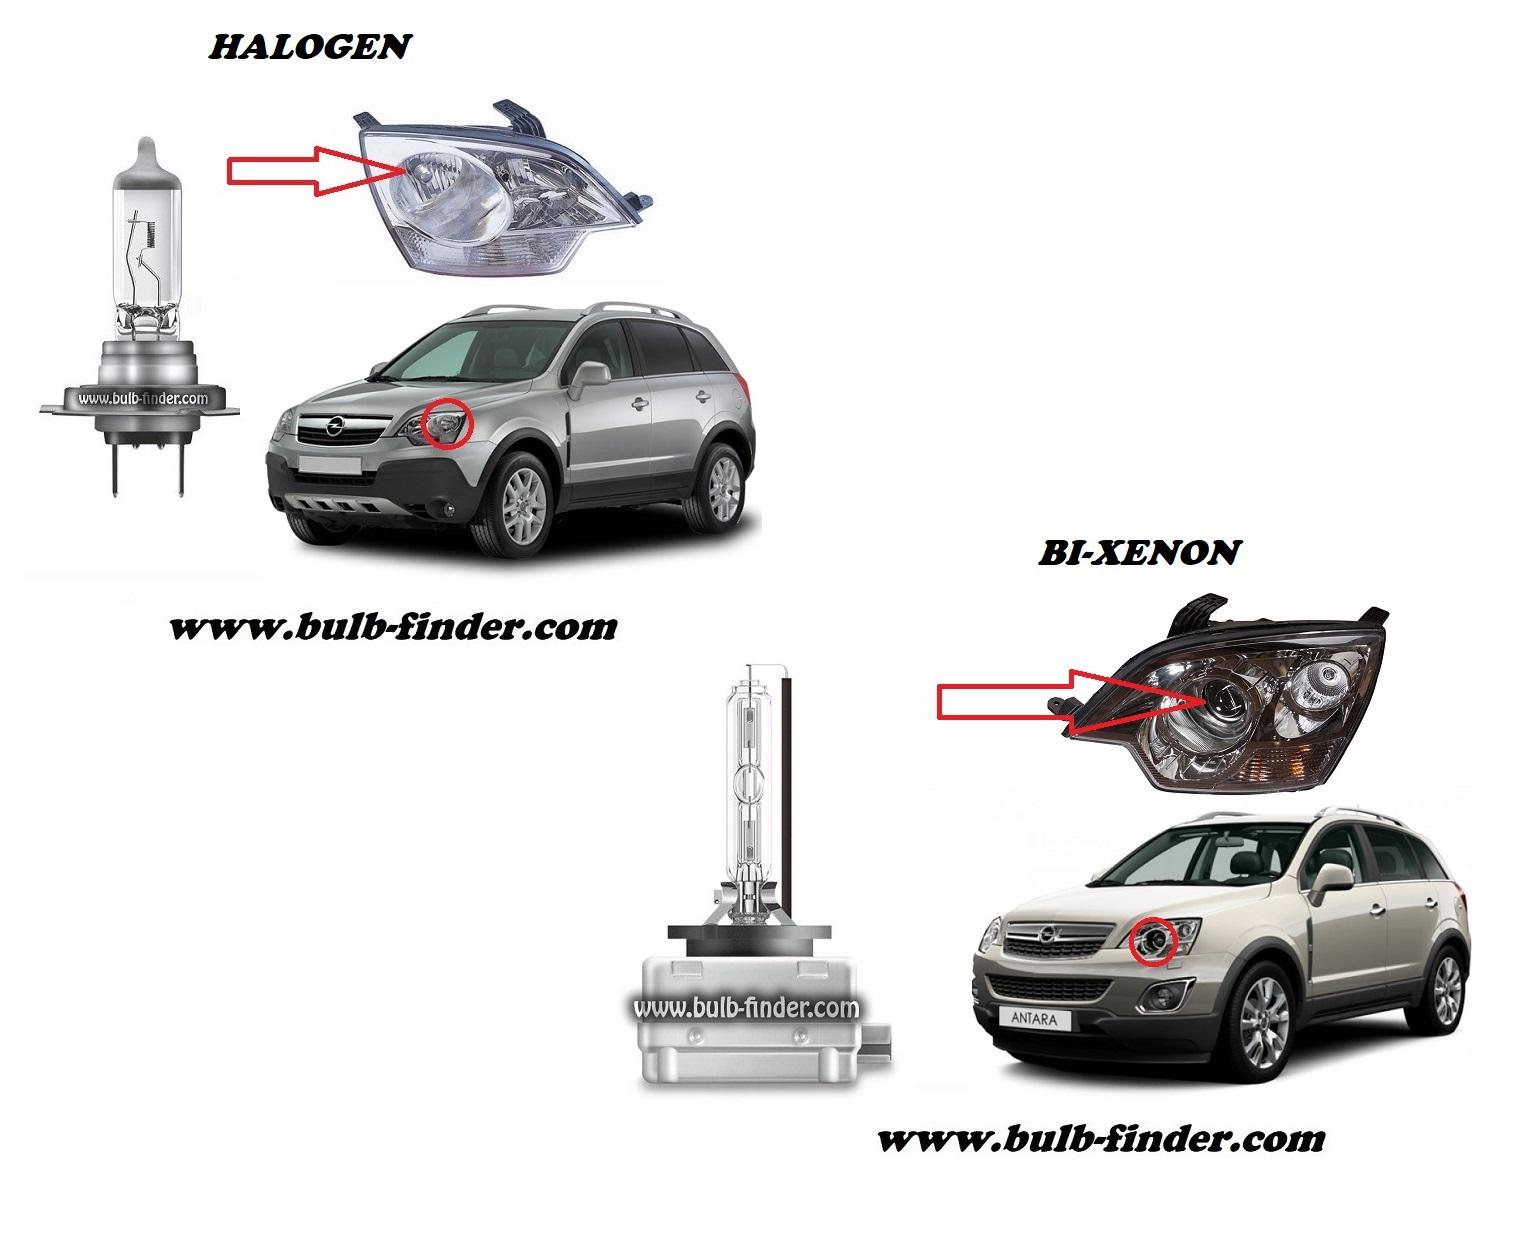 Vauxhall Antara bulbs specification for halogen headlamp